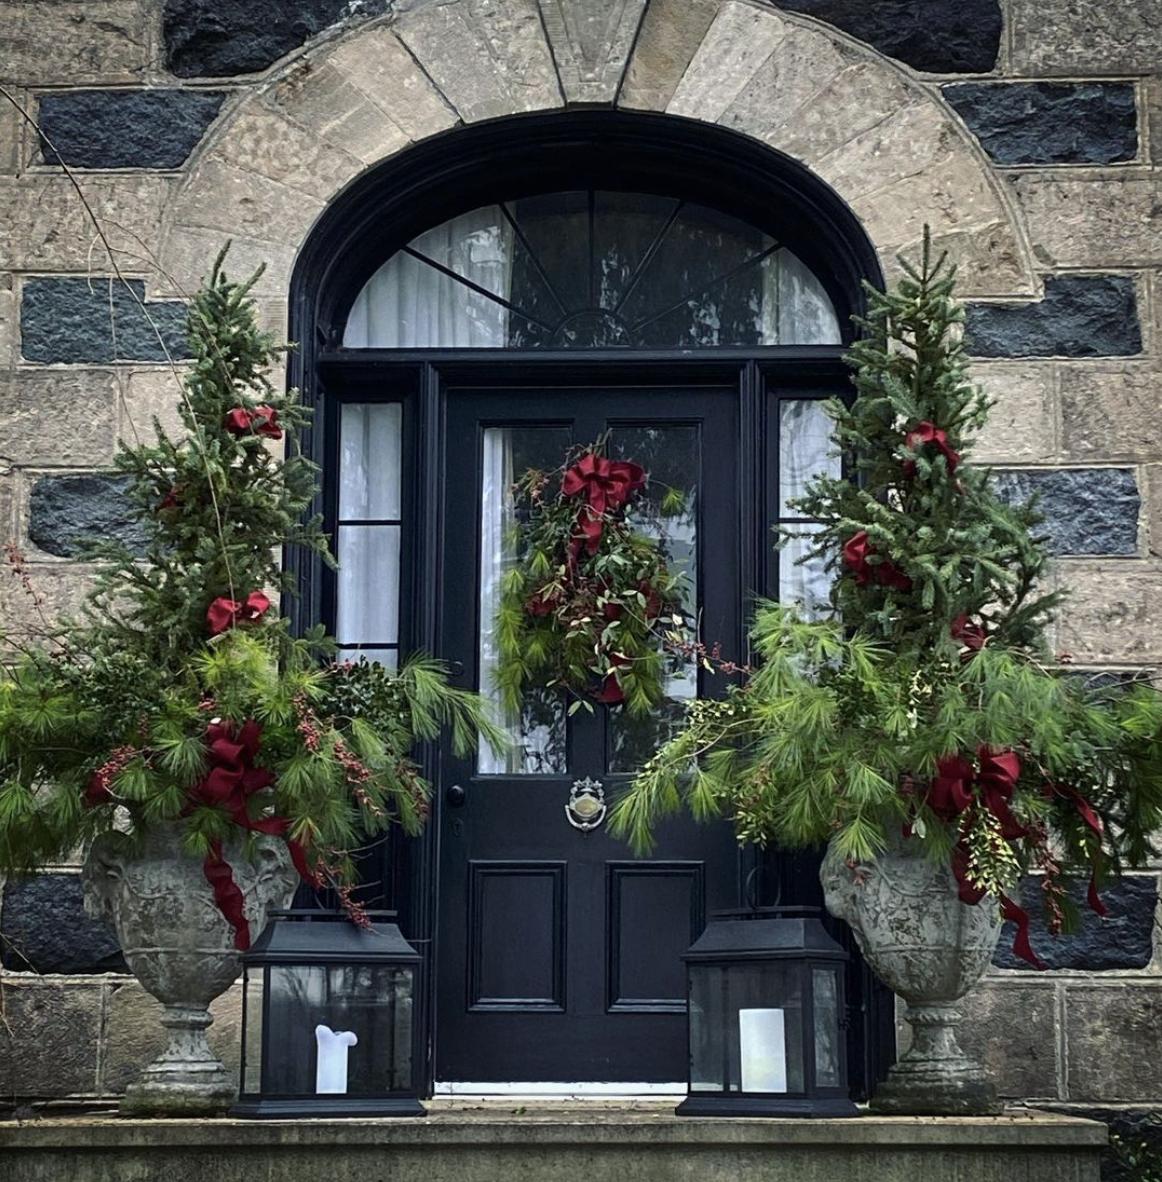 Beautiful old stone farmhouse dressed for Christmas #christmas #farmhousechristmas #christmasporch #christmasurns #christmasplanters #outdoorchristmasdecor #classicchristmas